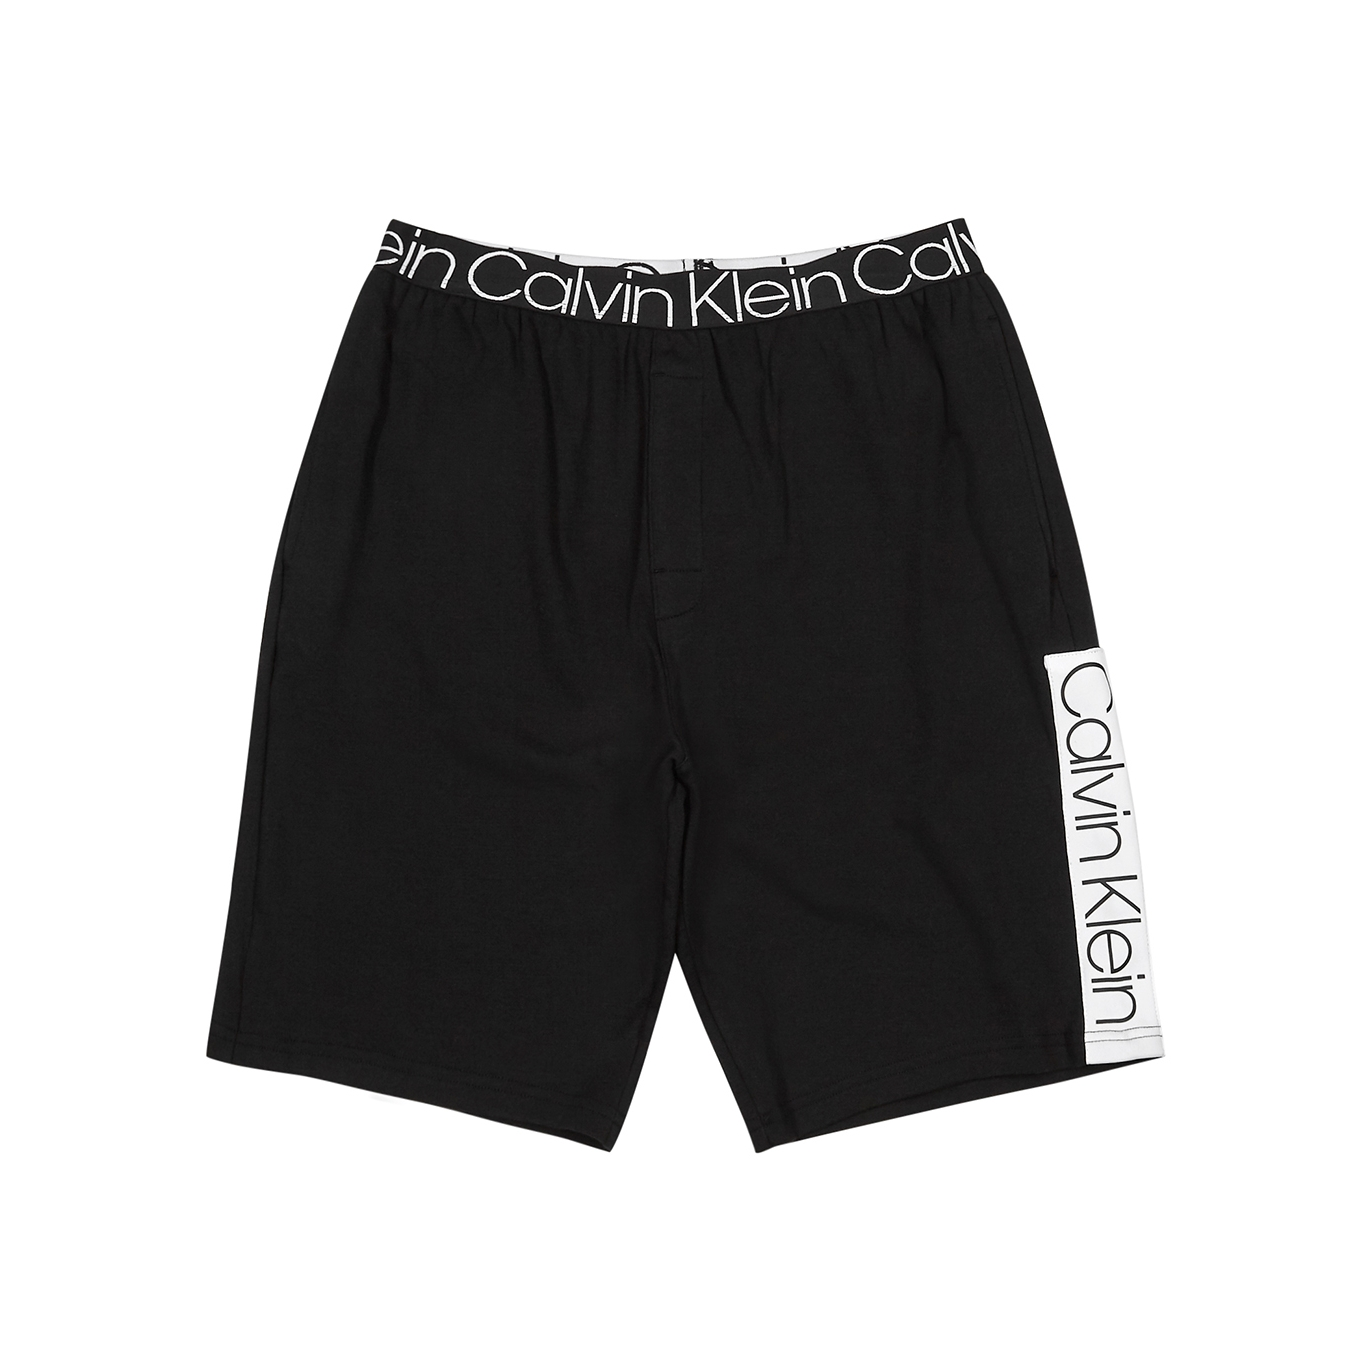 promo code b8351 e0f8e Black logo cotton shorts